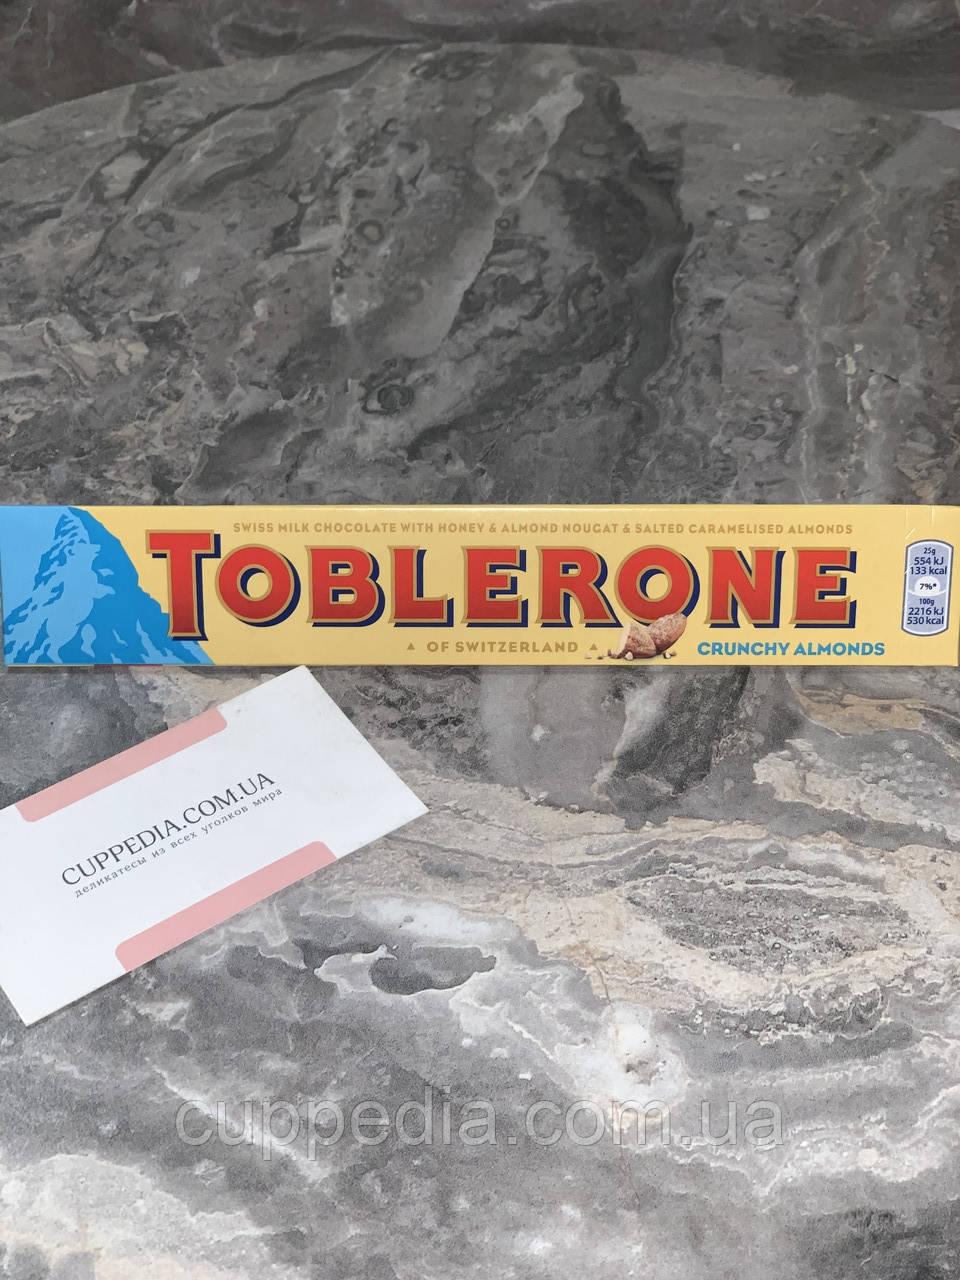 Молочний шоколад Toblerone (мед, мигдальний нуга, карамелізований мигдаль)